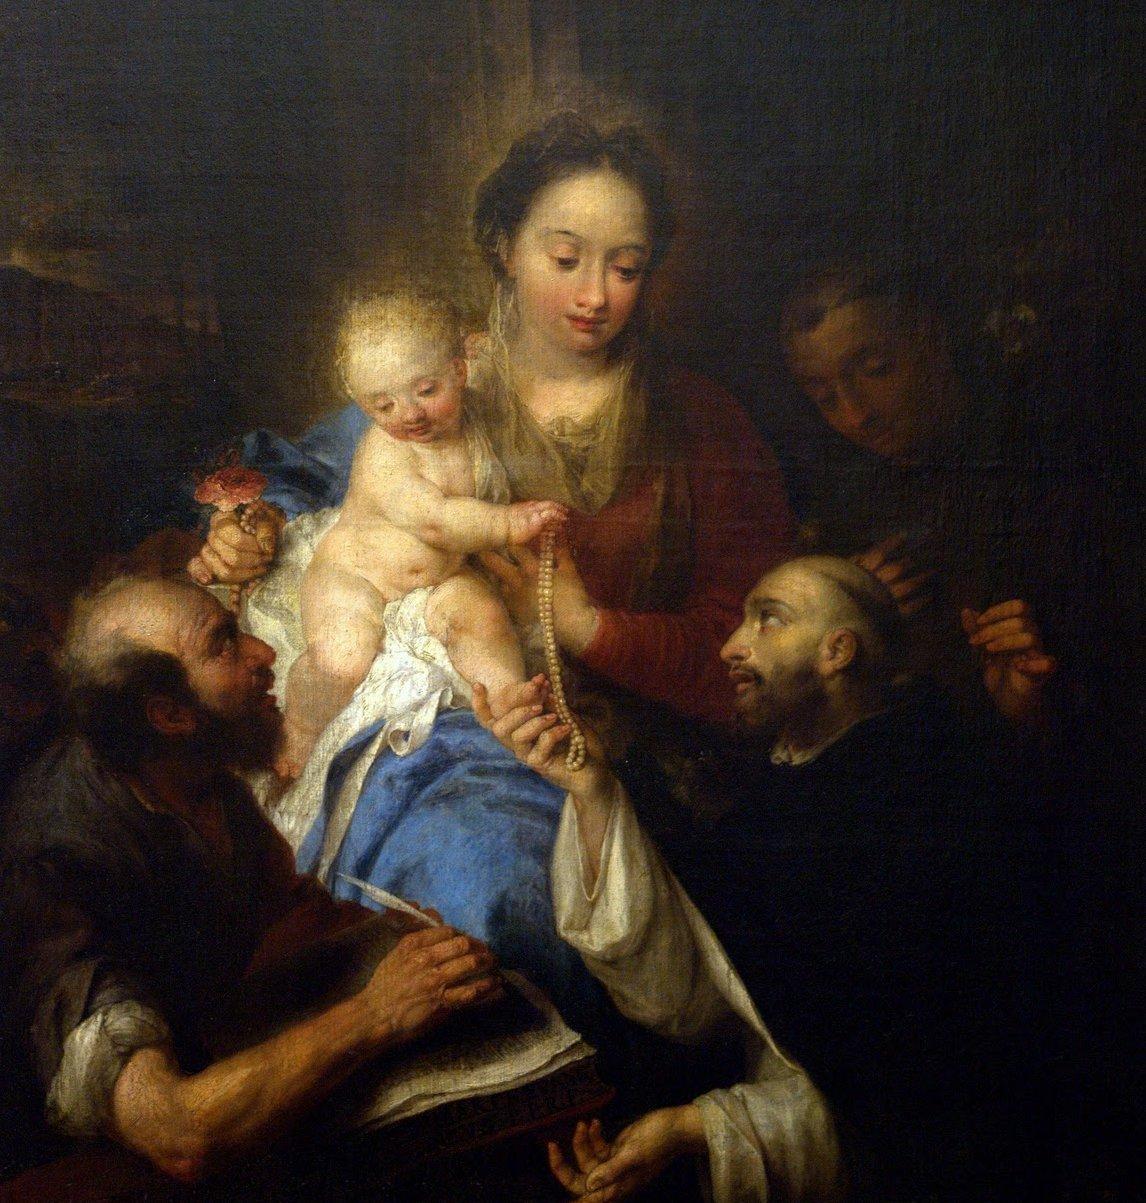 http://3.bp.blogspot.com/-EAfYELuztIU/T6p-8zjtn5I/AAAAAAAACII/ybwAeye9urg/s1600/our+lady+of+the+rosary+and+st+dominic.jpg